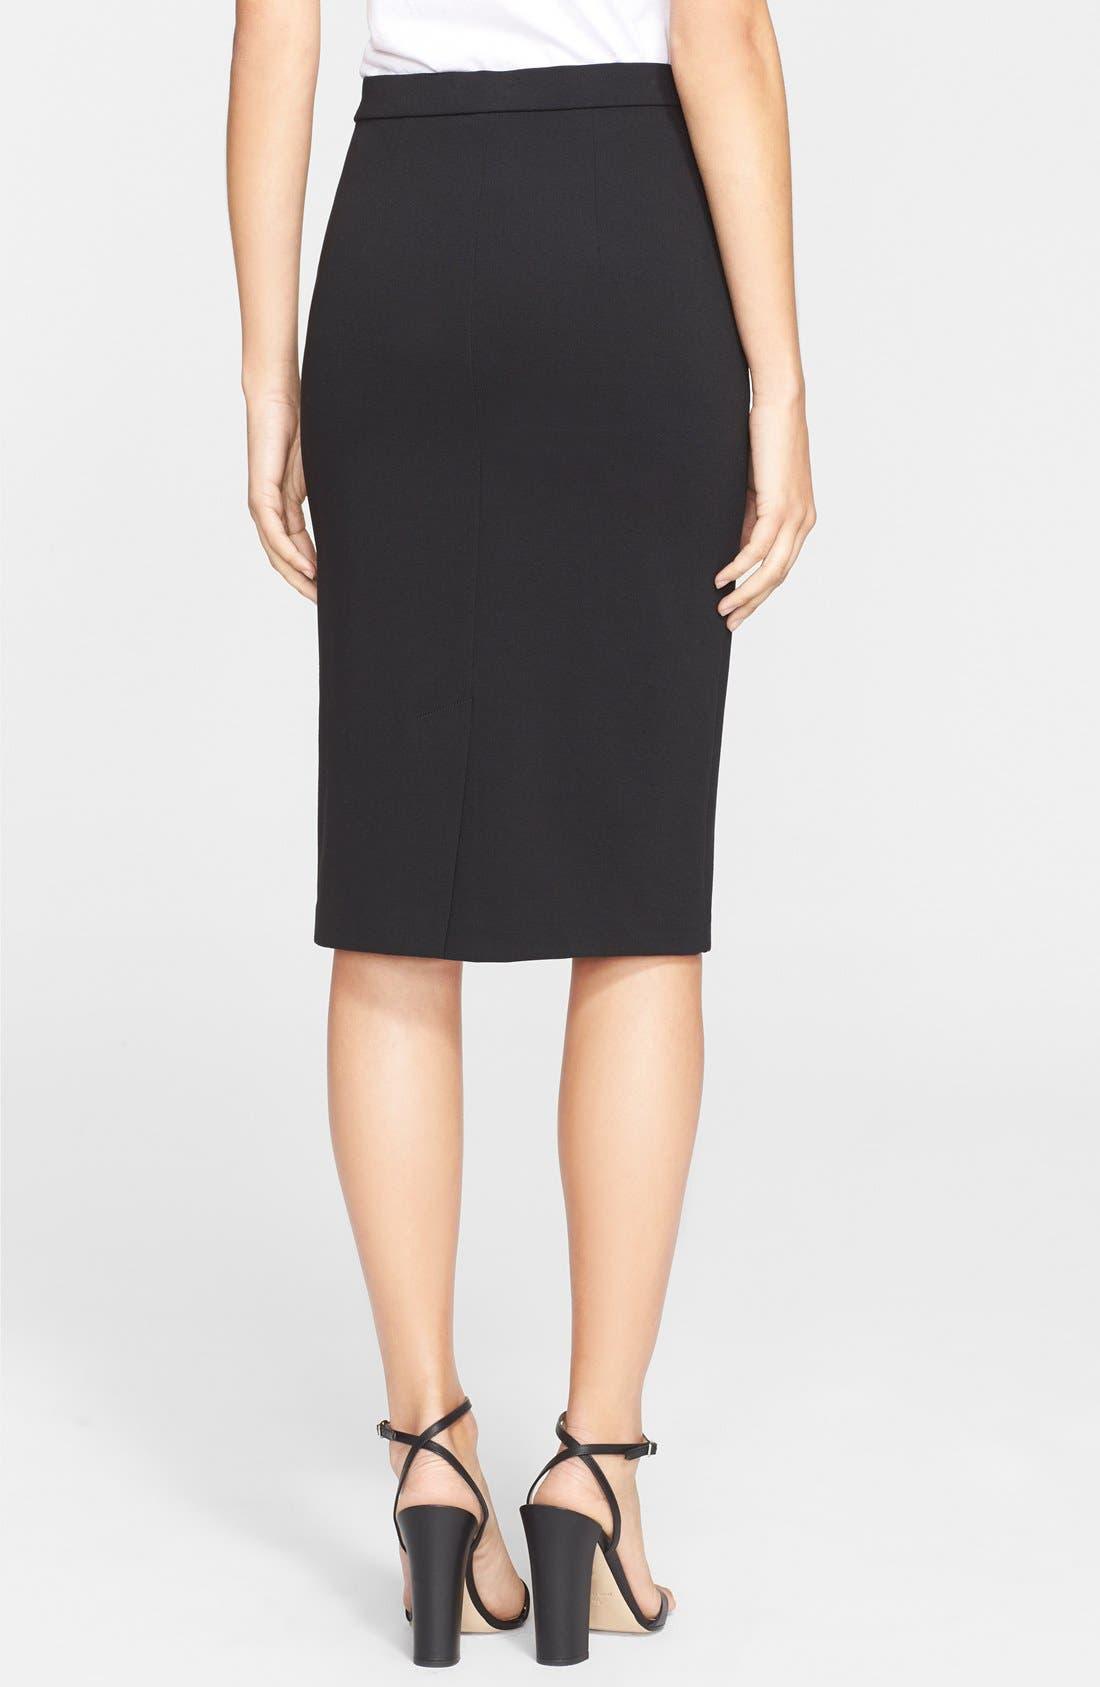 Alternate Image 2  - Theory 'Lijnek' Ponte Knit Pencil Skirt